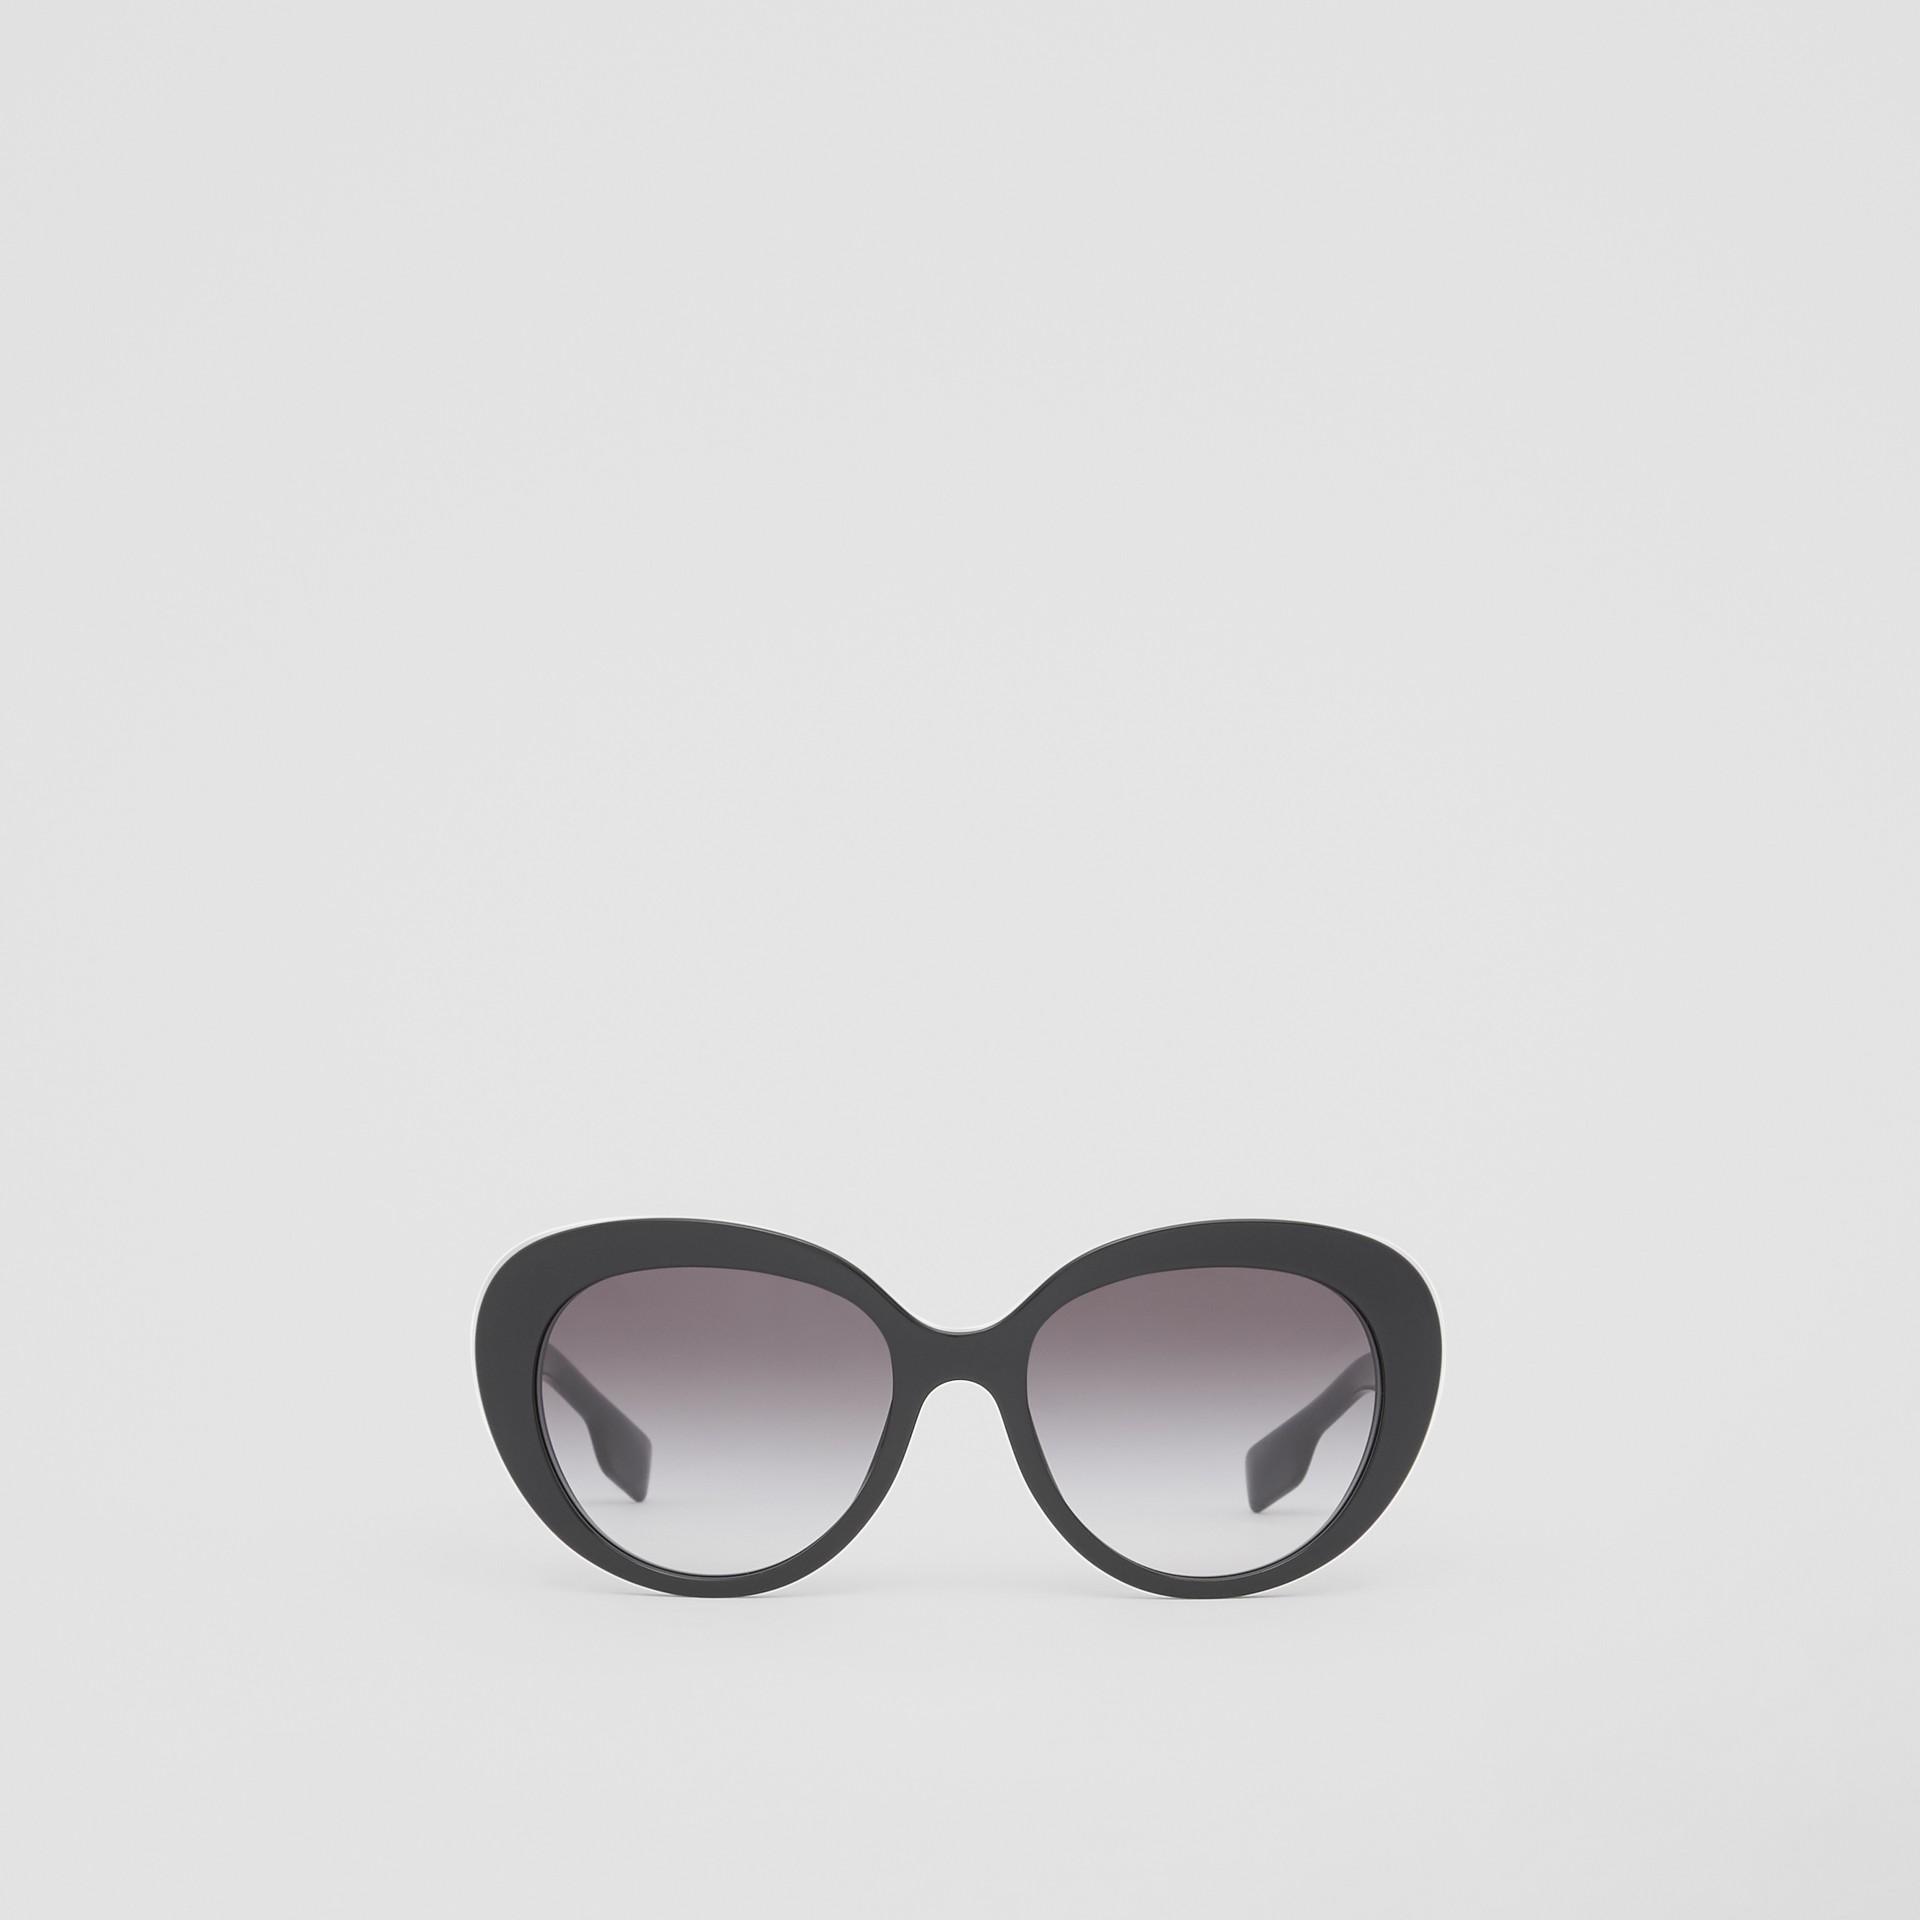 Monogram Motif Cat-eye Frame Sunglasses in Black - Women | Burberry United Kingdom - gallery image 0